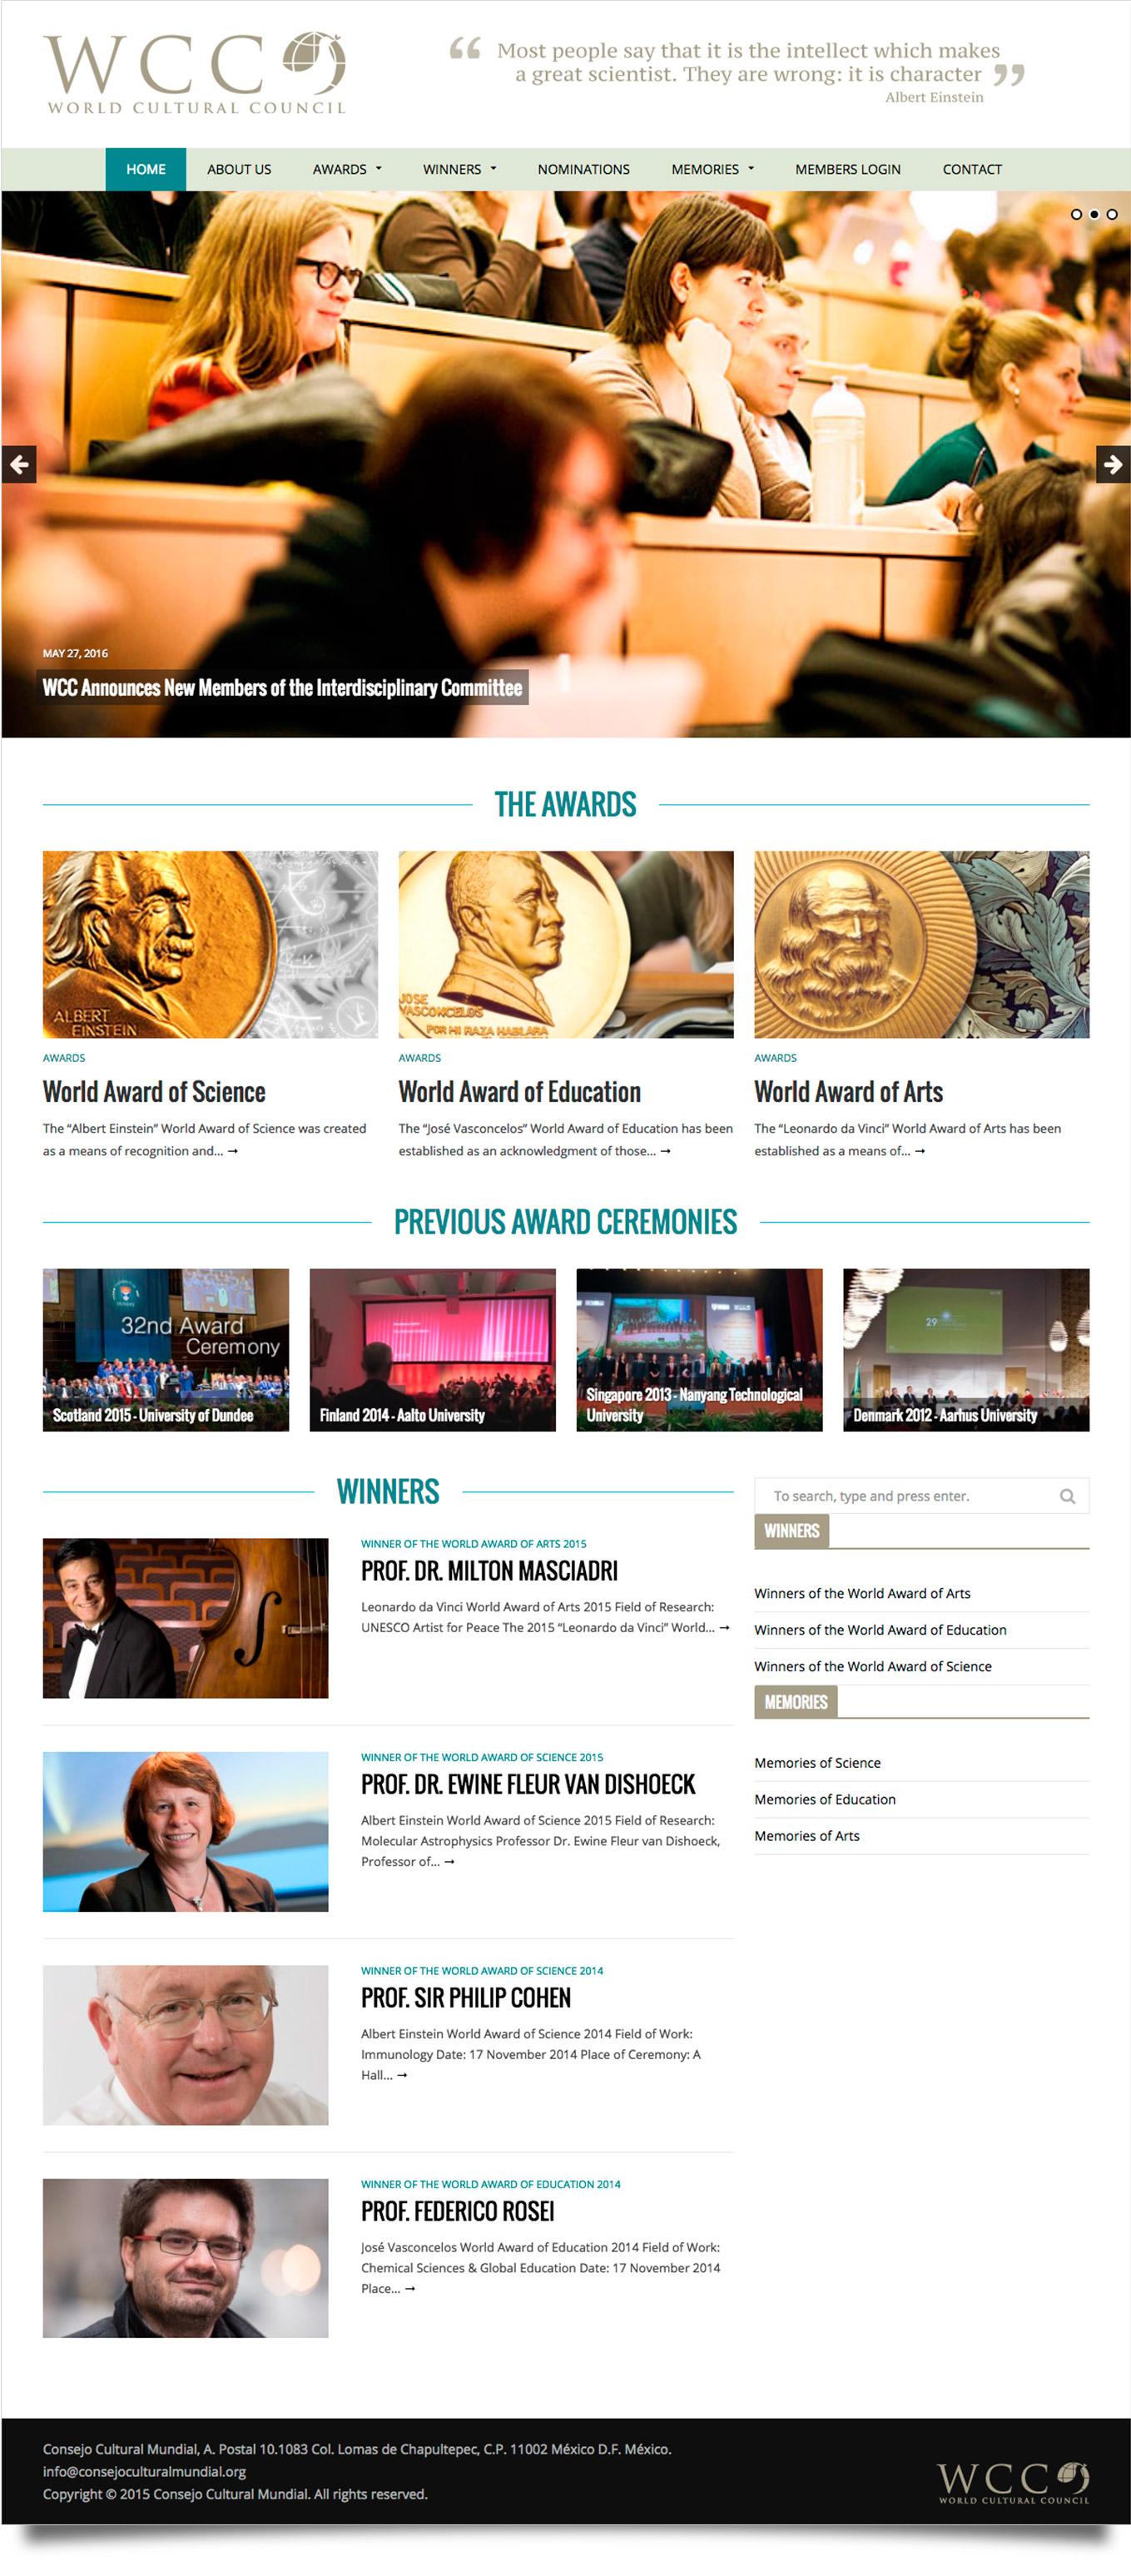 World Cultural Council - Diseño de Página Web - CreadoresWeb.mx